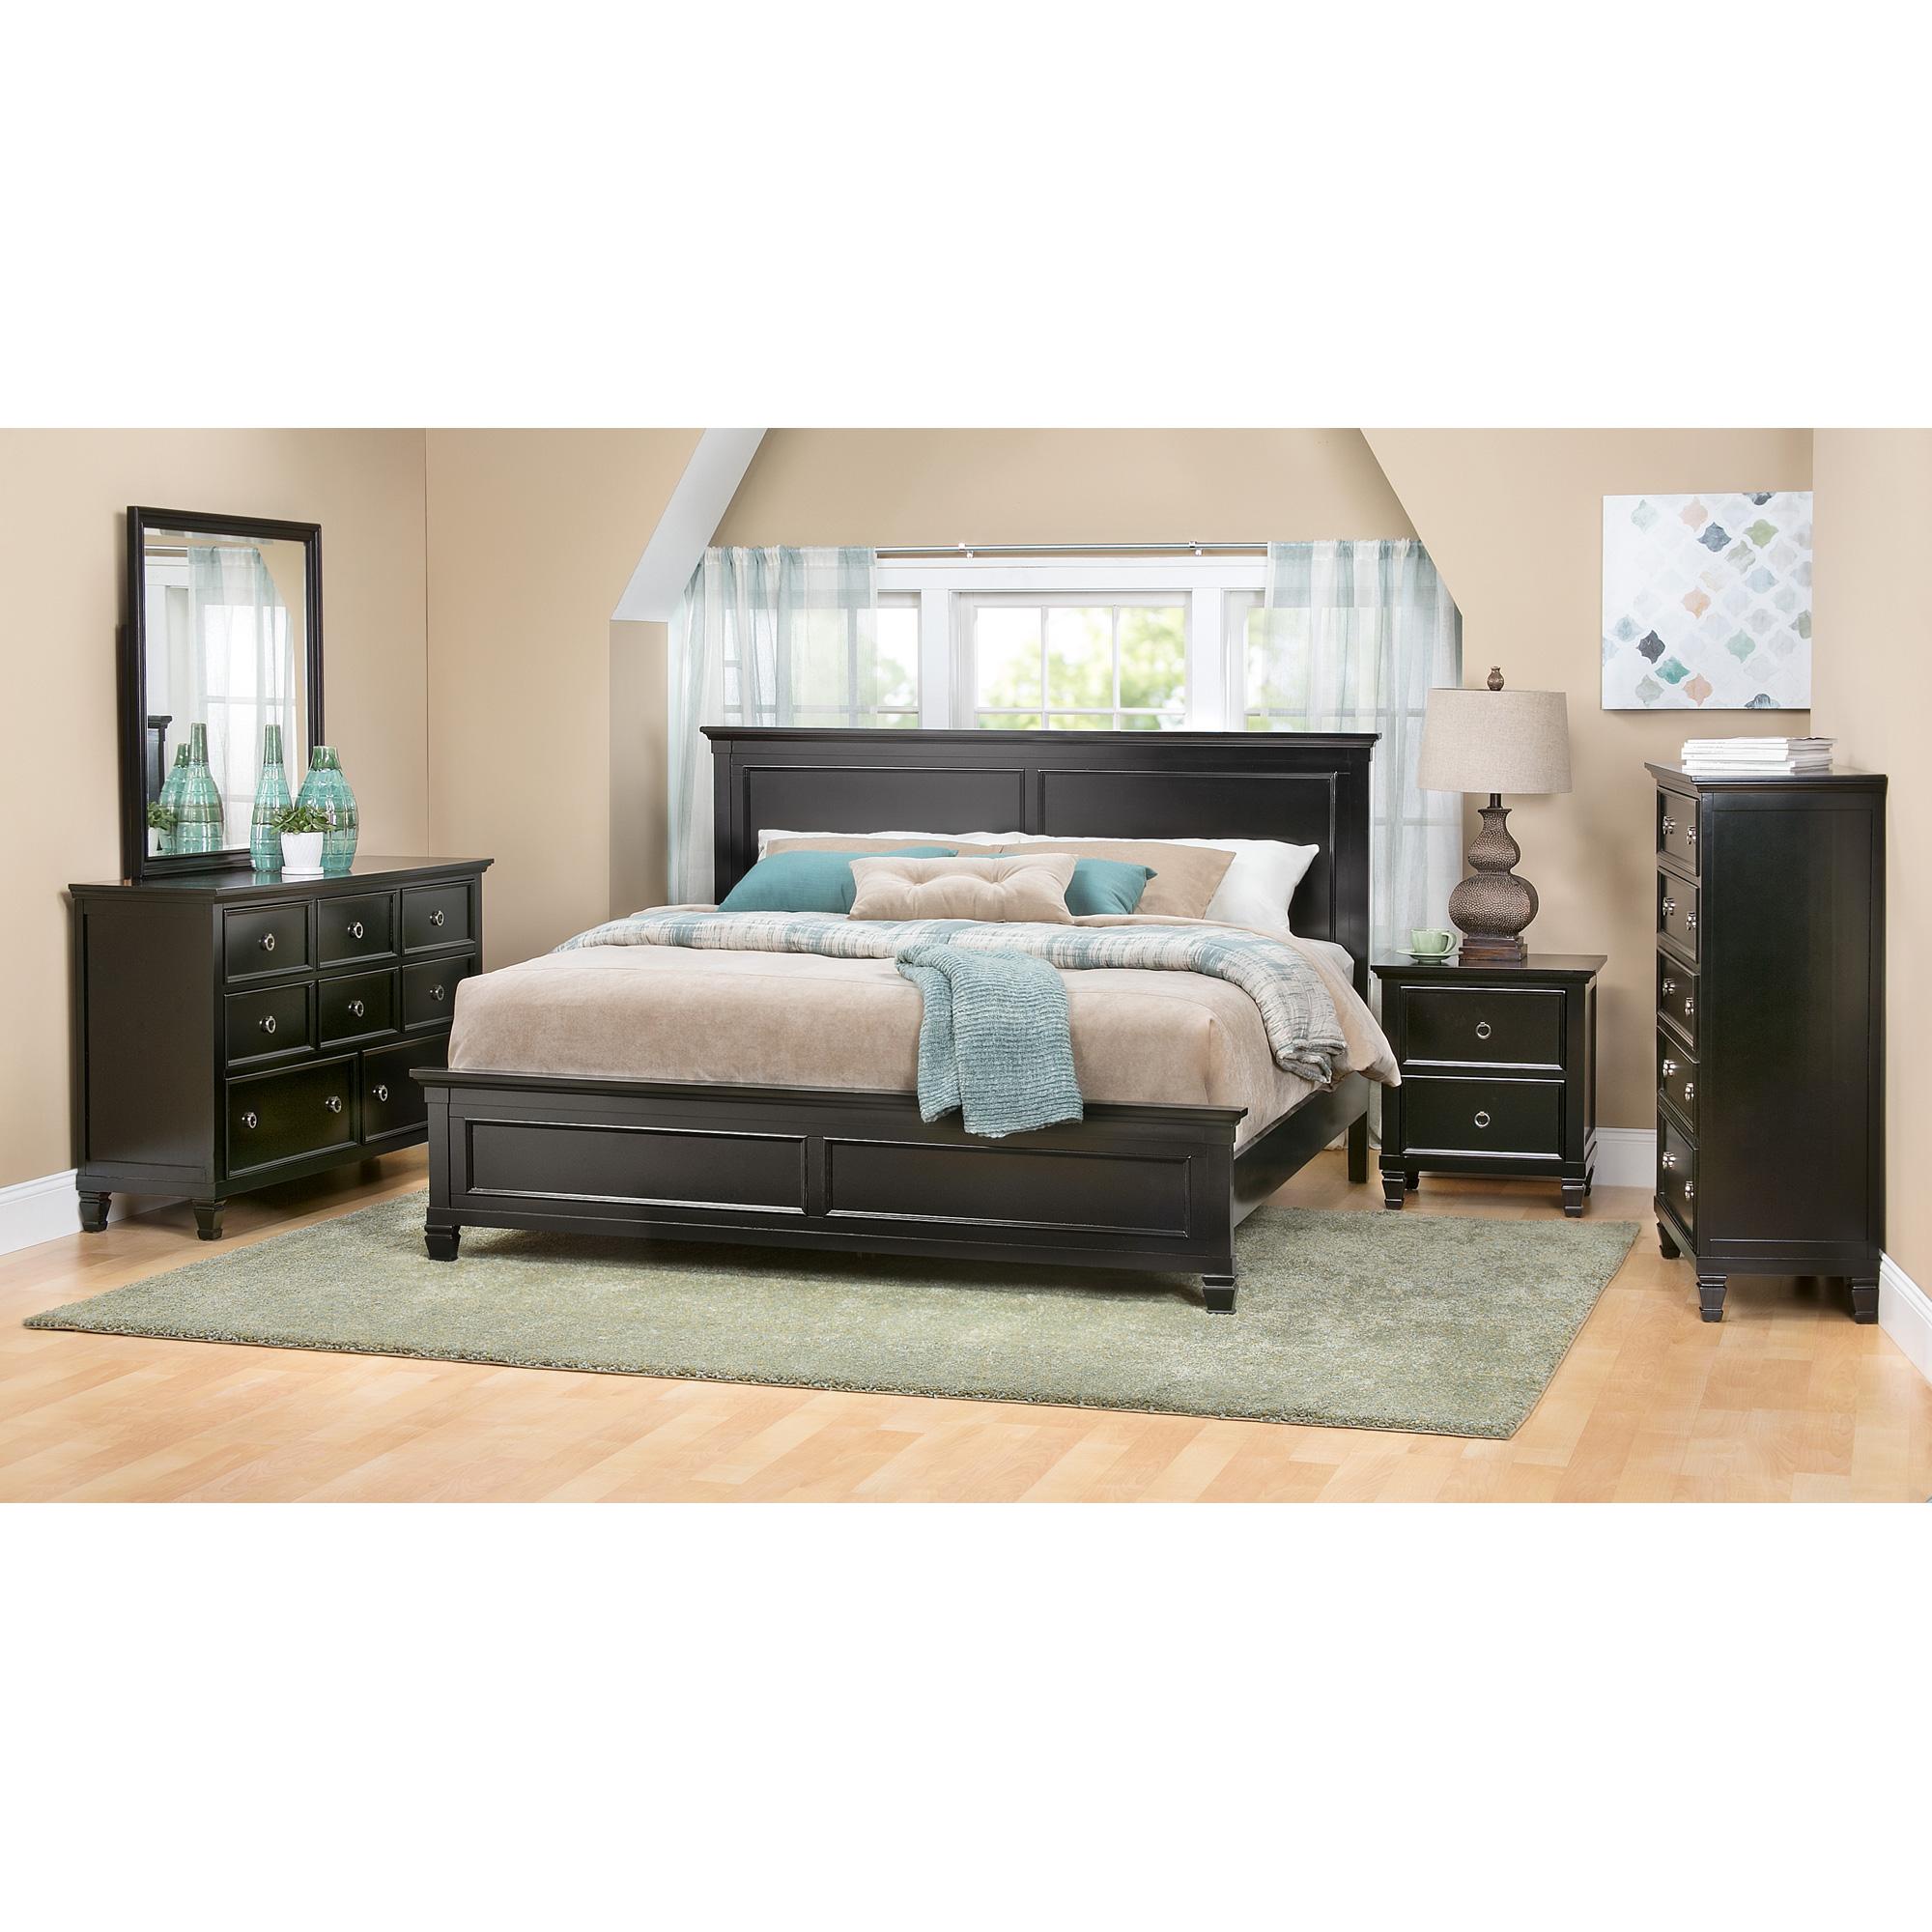 New Classic | Persia II Black Twin 4 Piece Room Group Bedroom Set